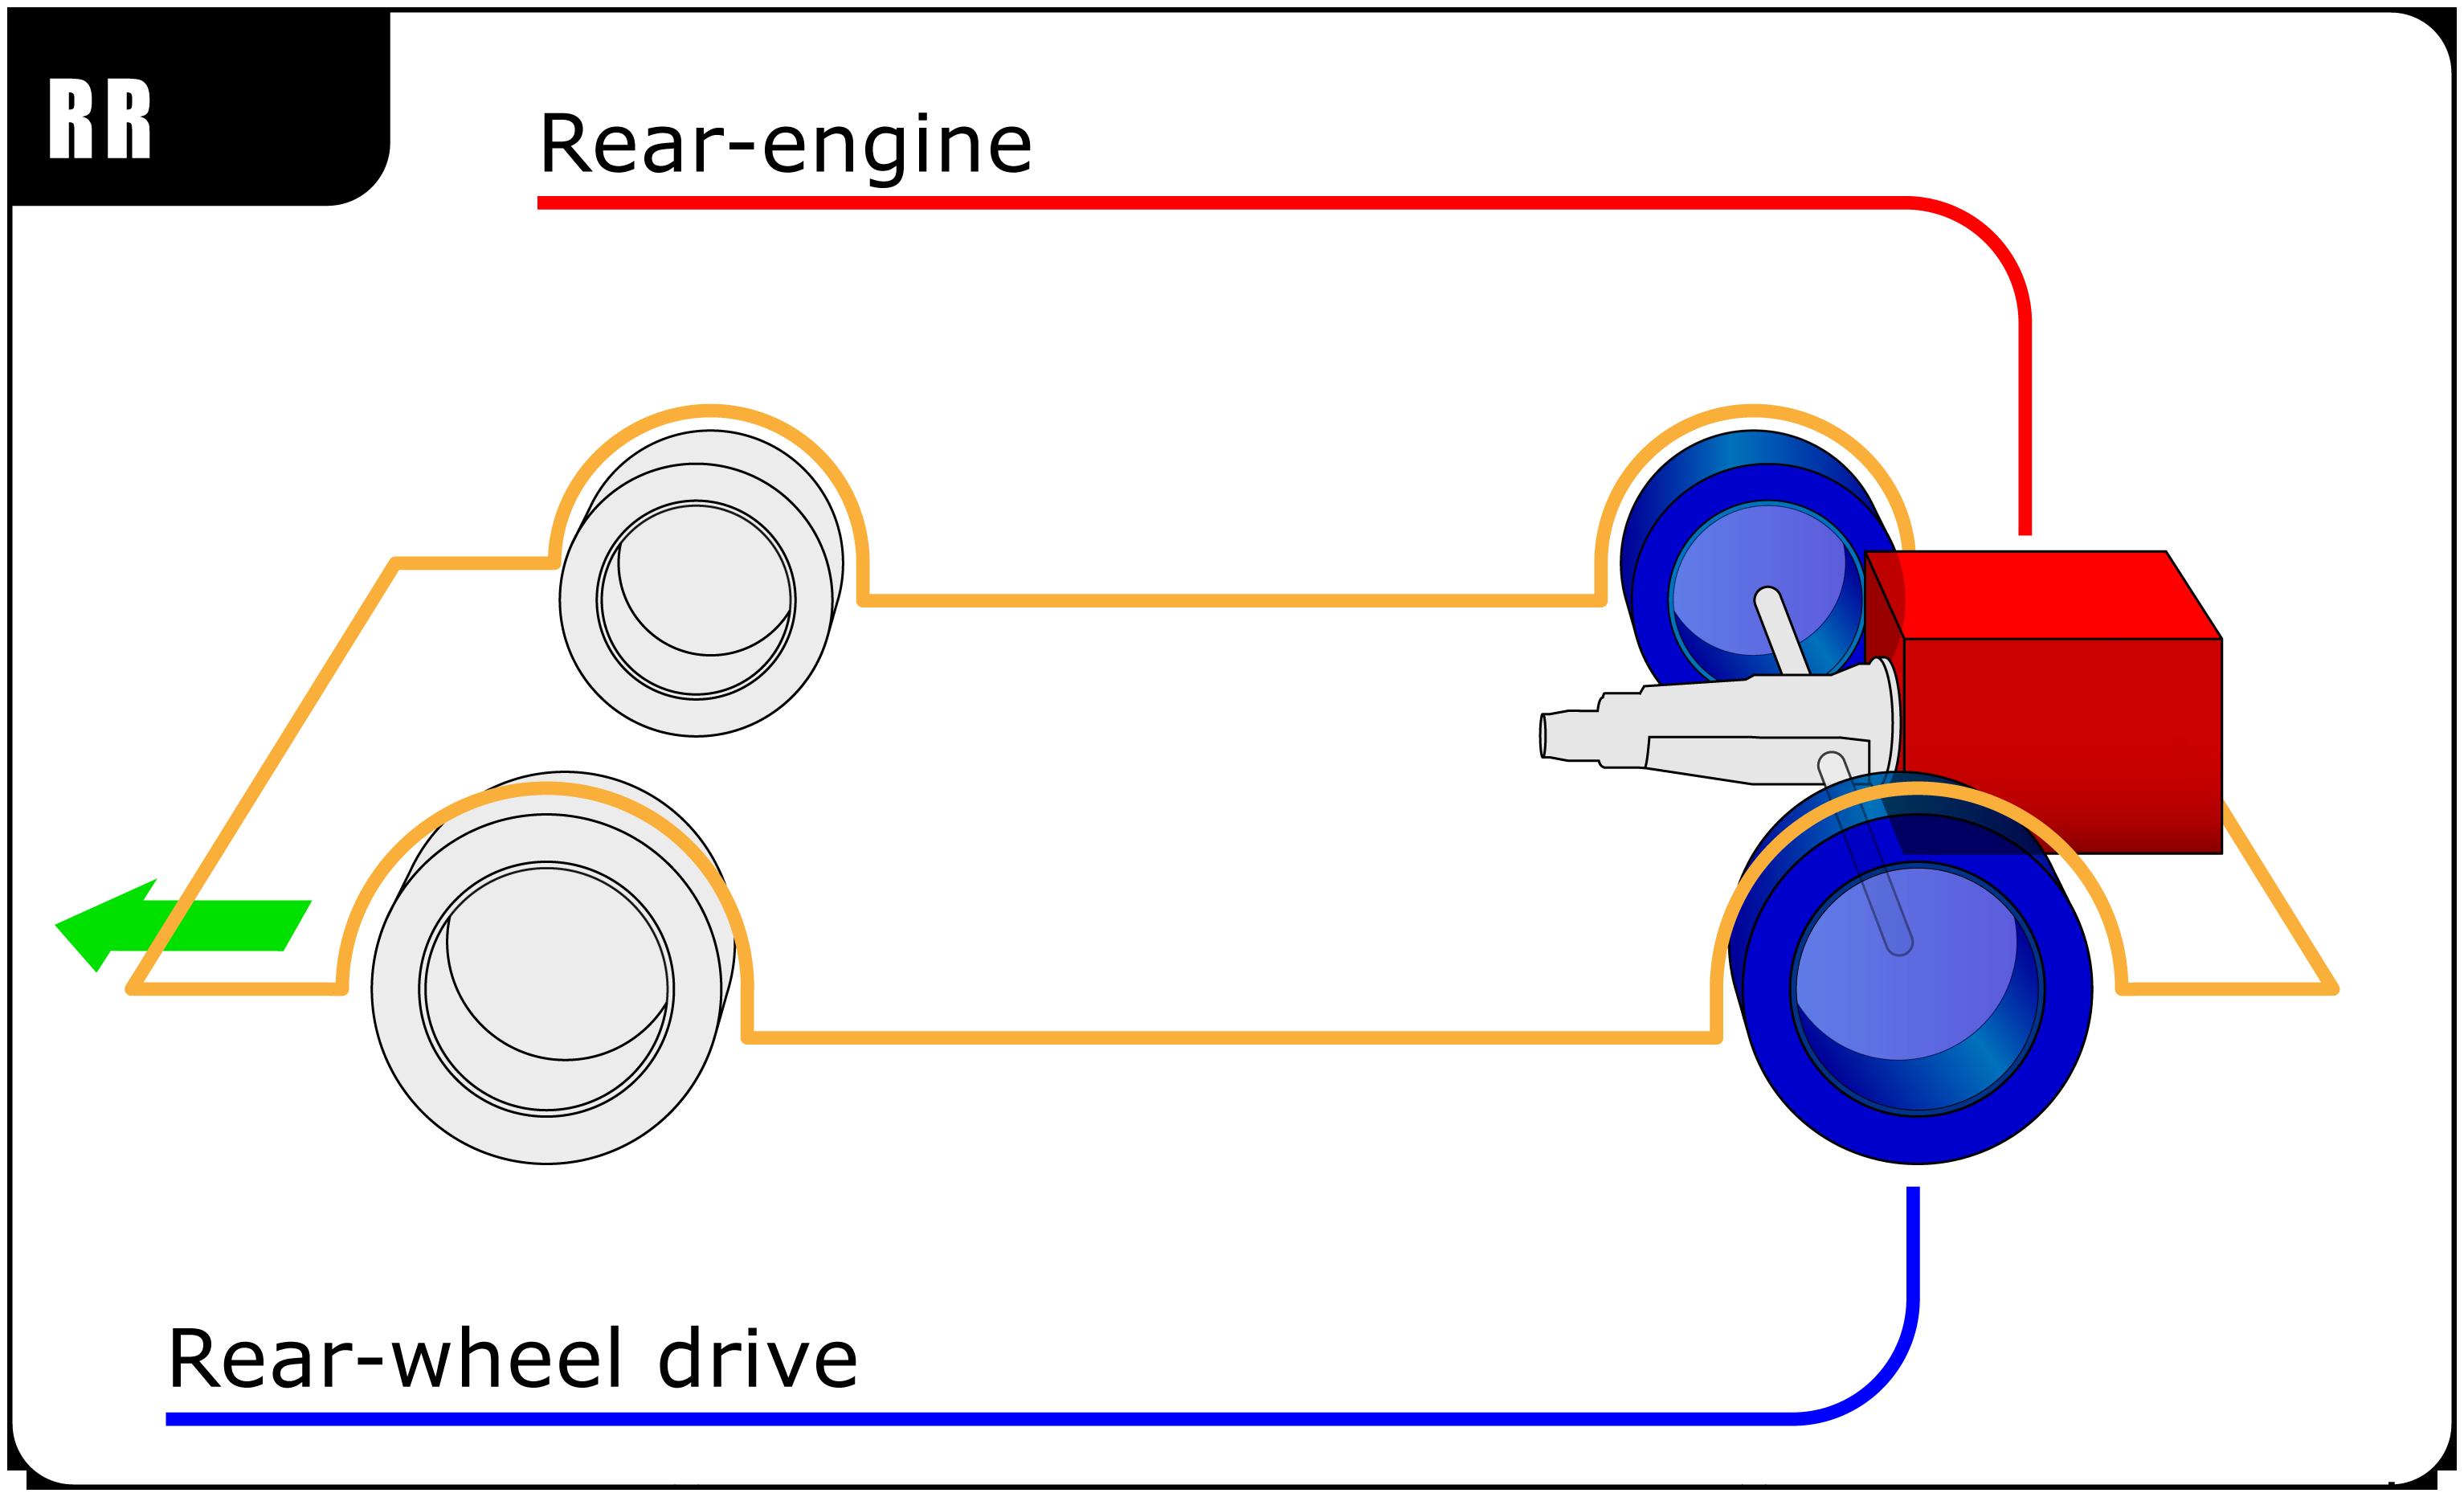 RR layout